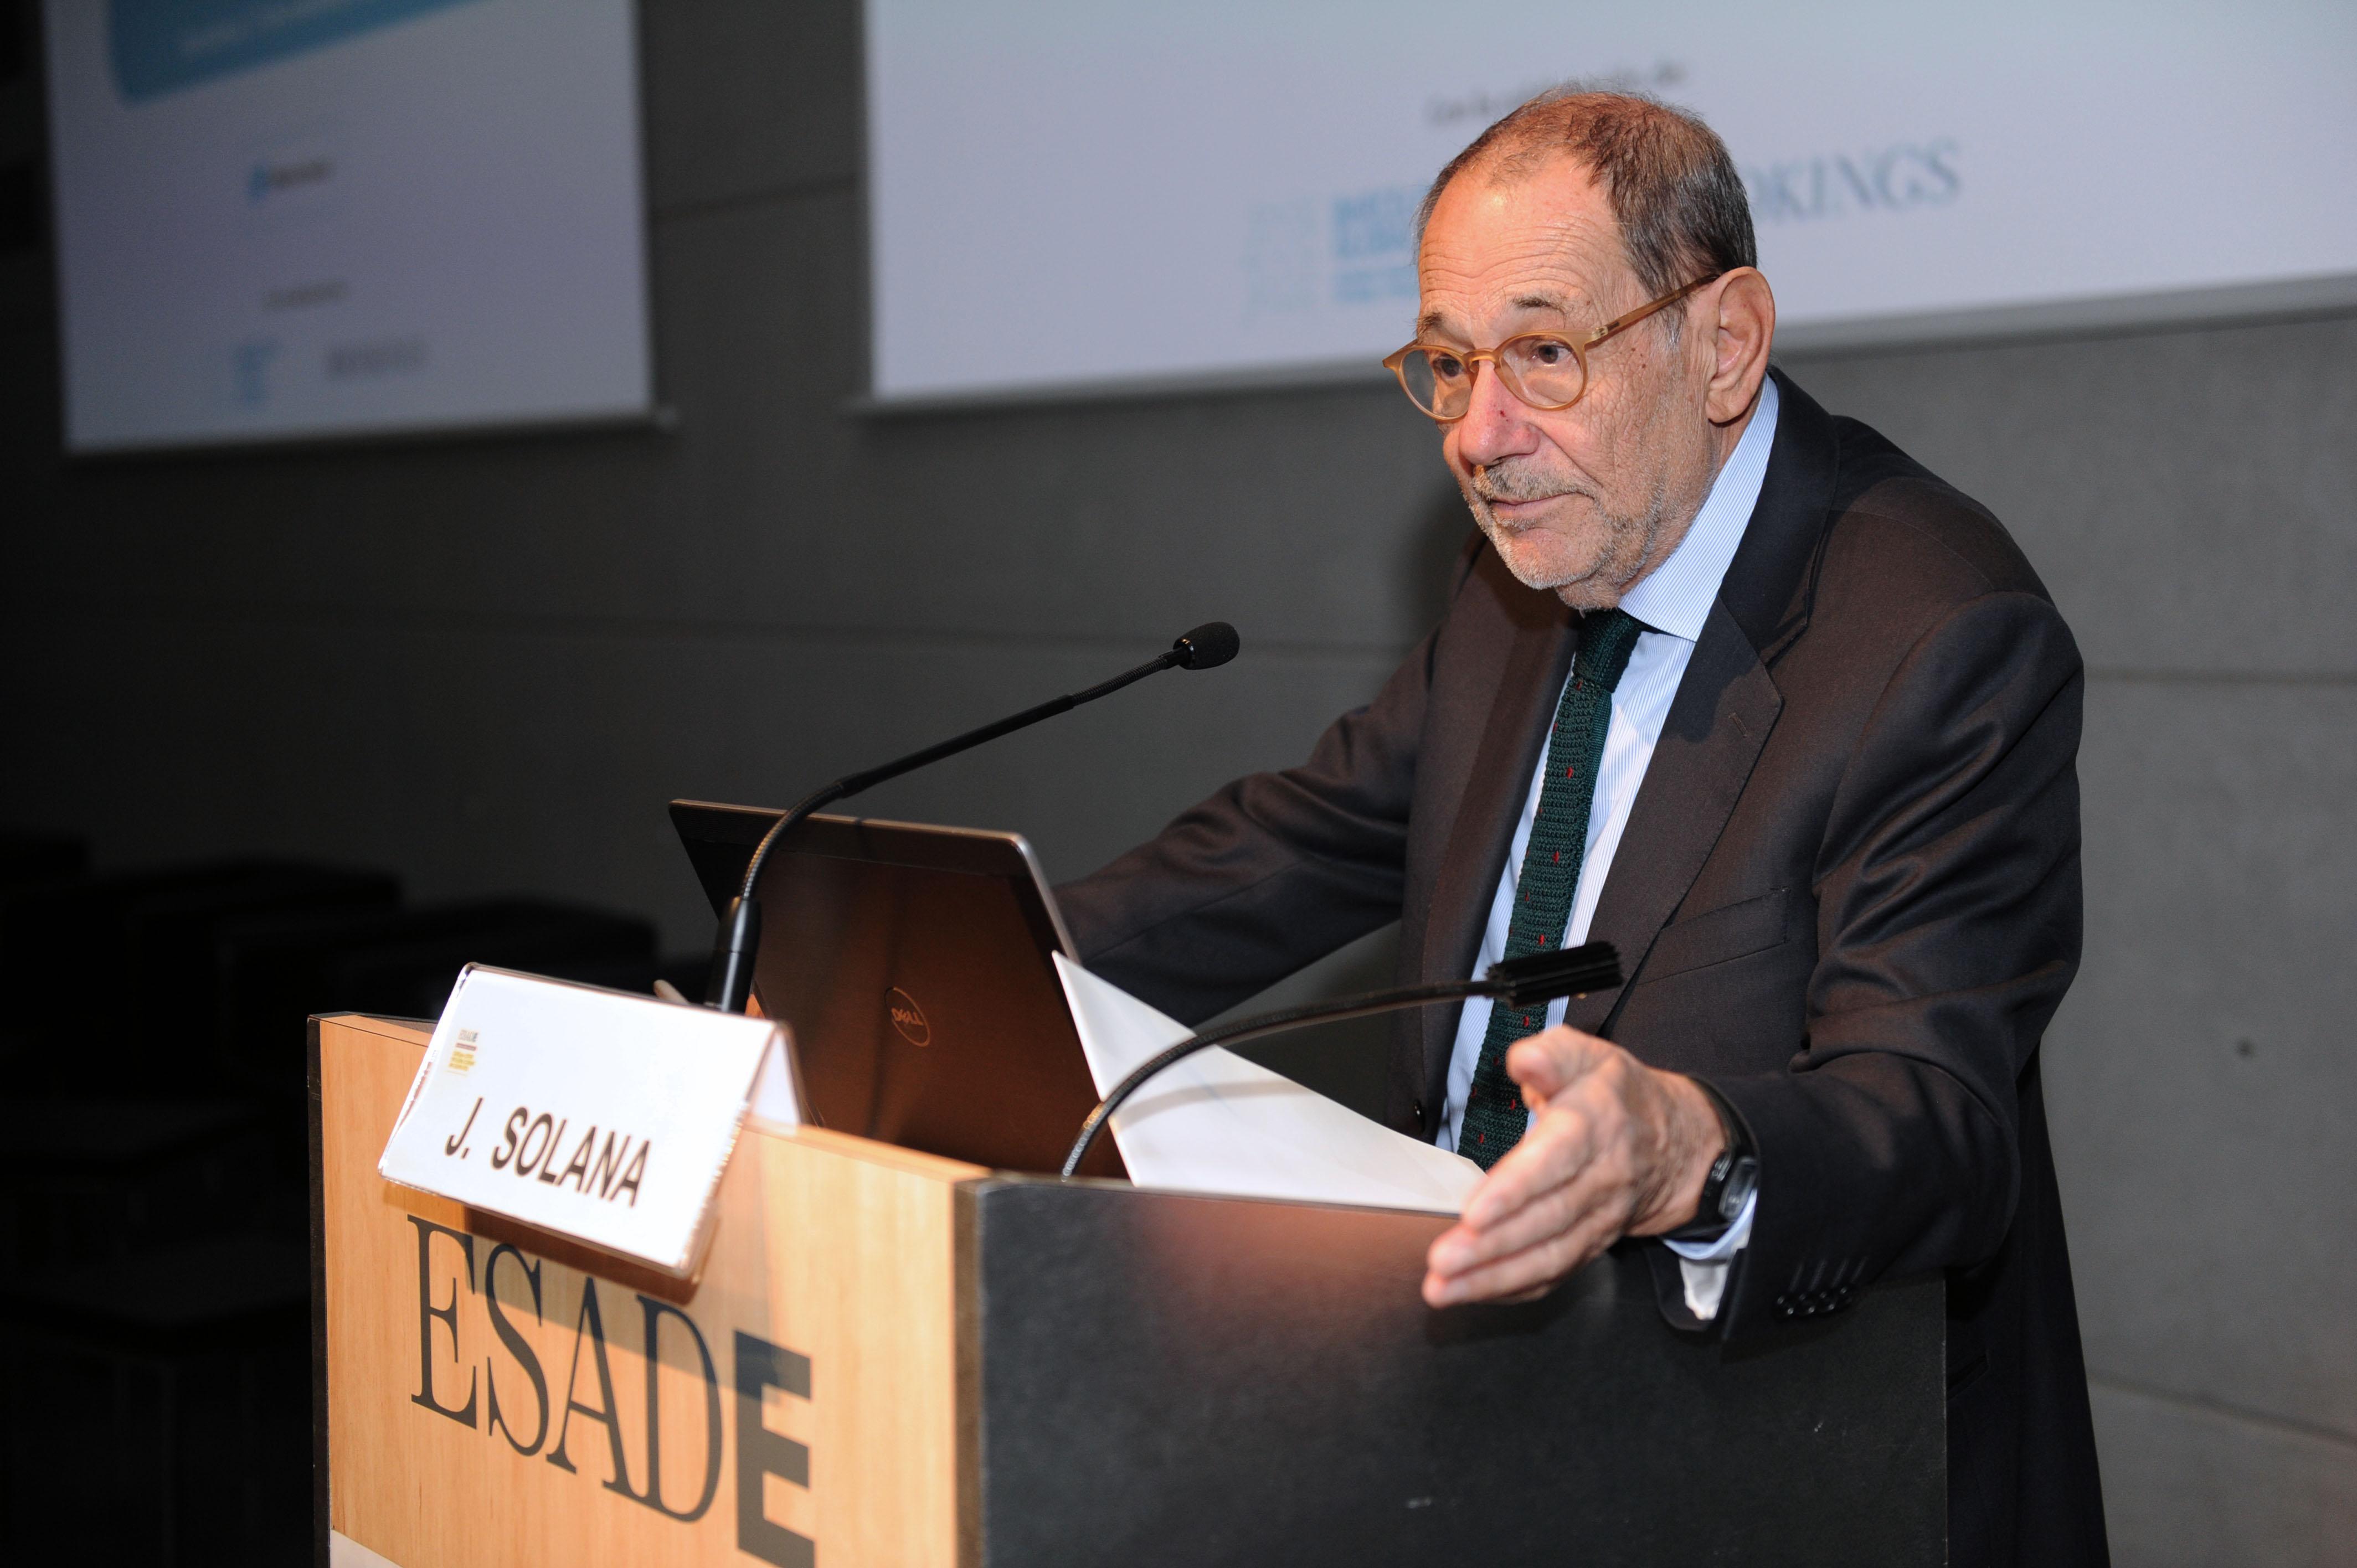 Javier Solana. ESADEgeo